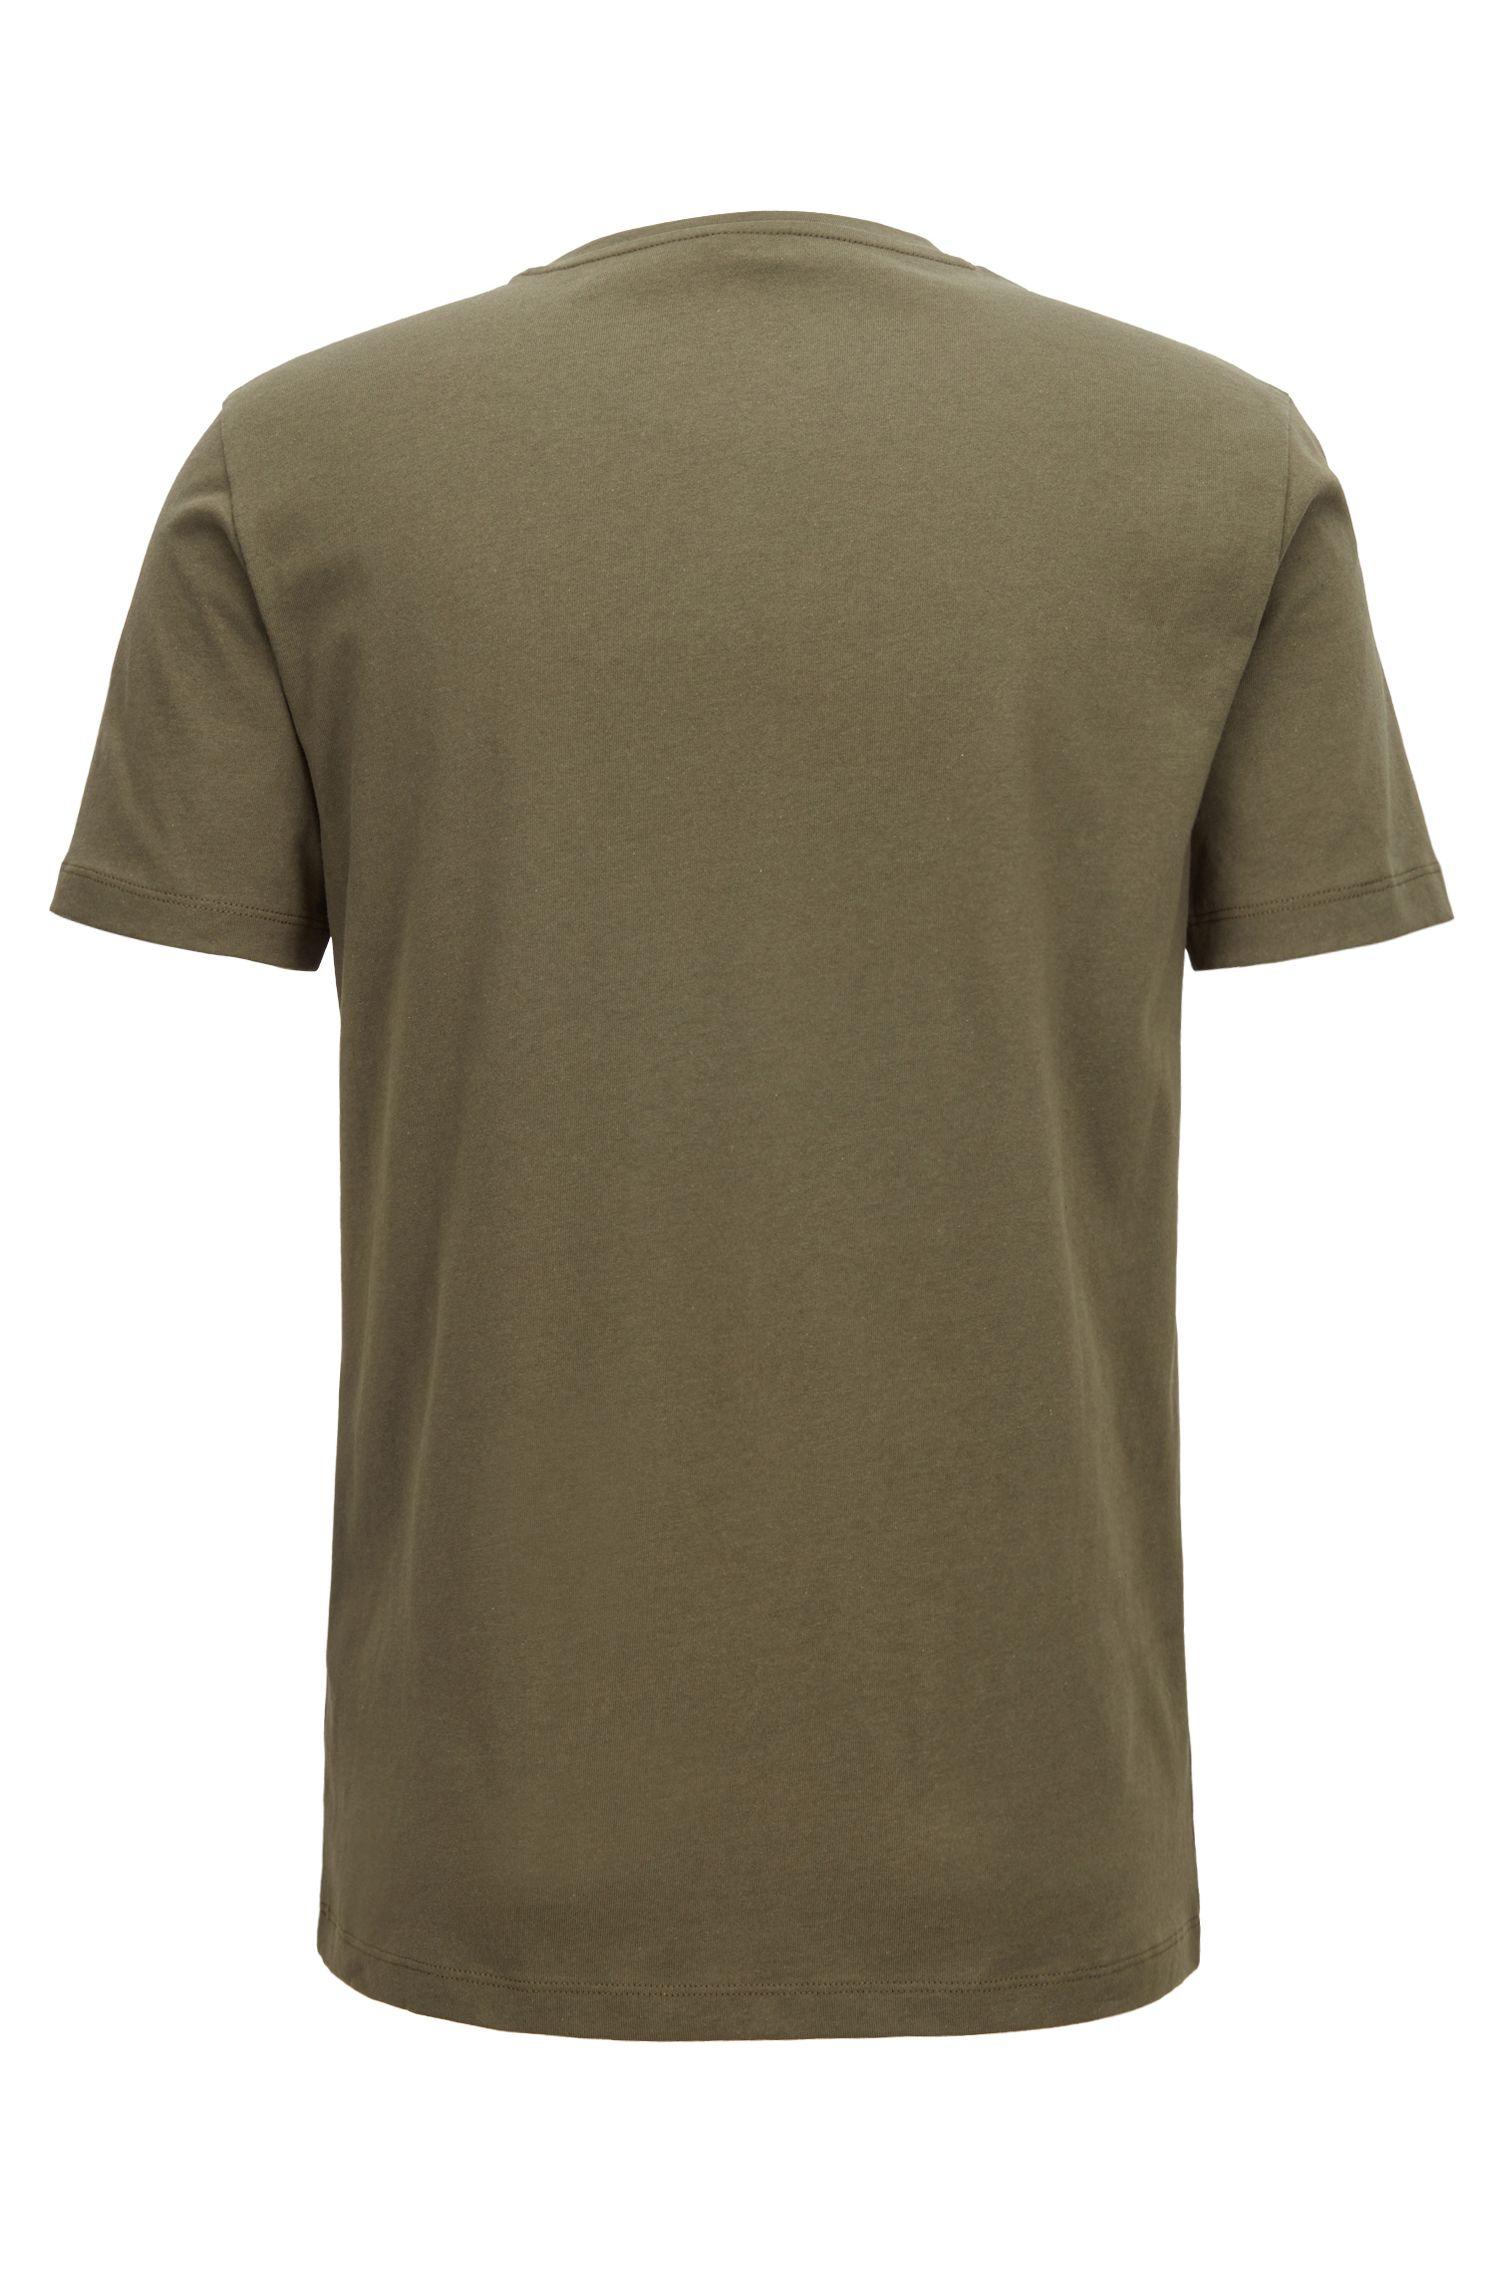 T-Shirt aus Baumwoll-Jersey mit Rundhalsausschnitt, Dunkelgrün